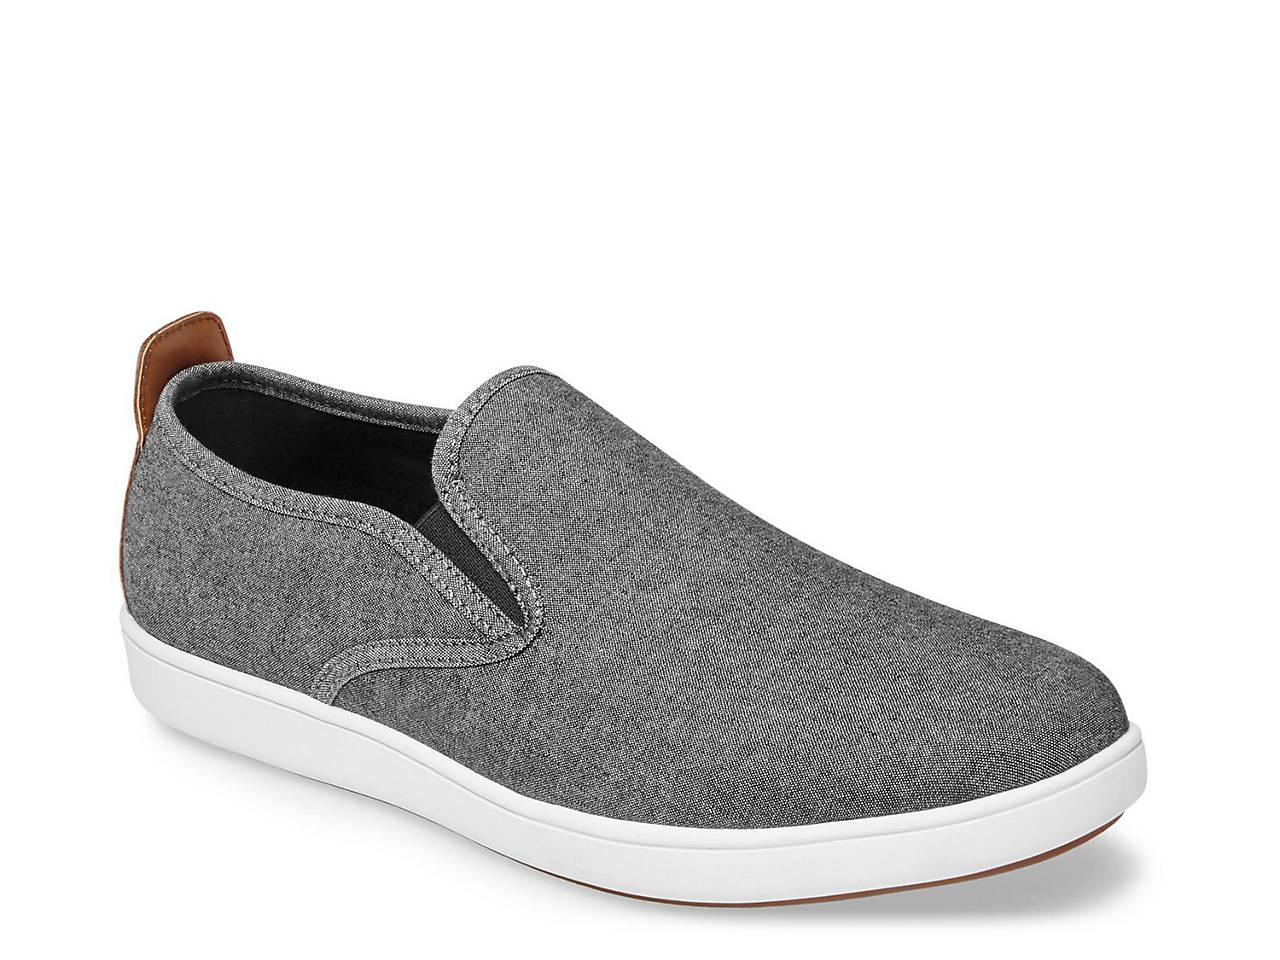 ec5739b4f99 Steve Madden Gears Slip-On Sneaker Men s Shoes